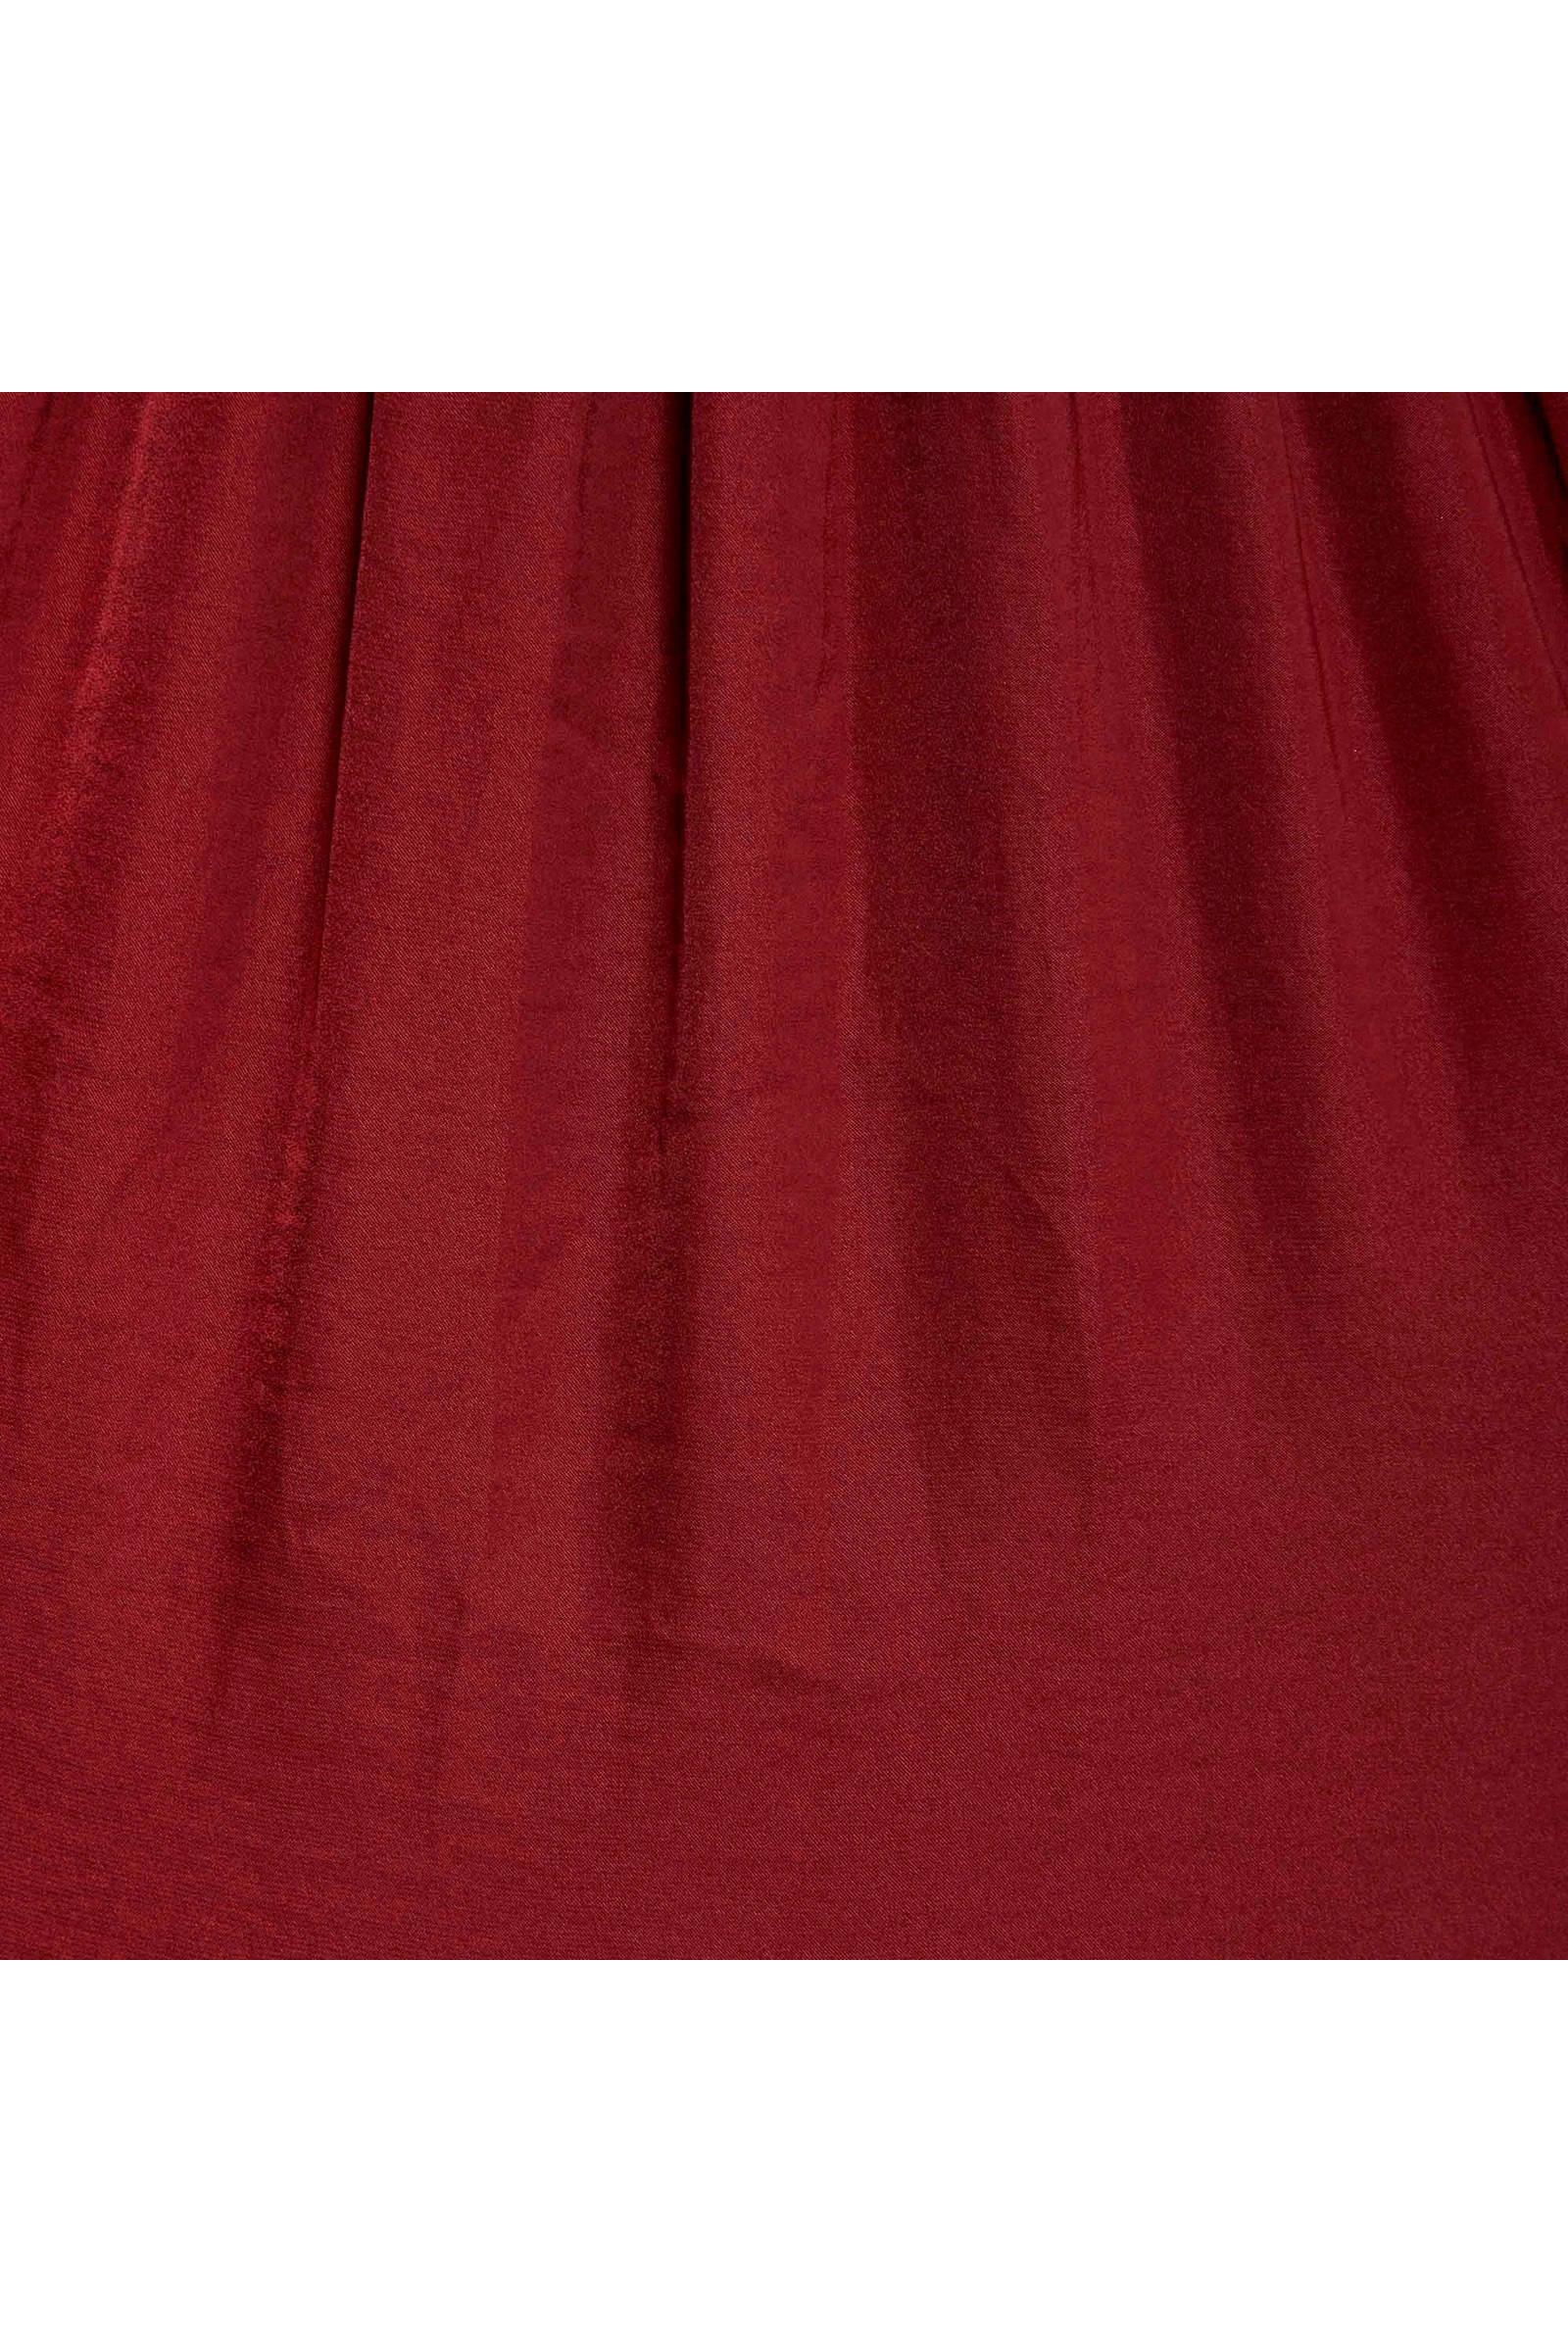 971718fcfc0b33 Morgan maxi jurk bordeaux